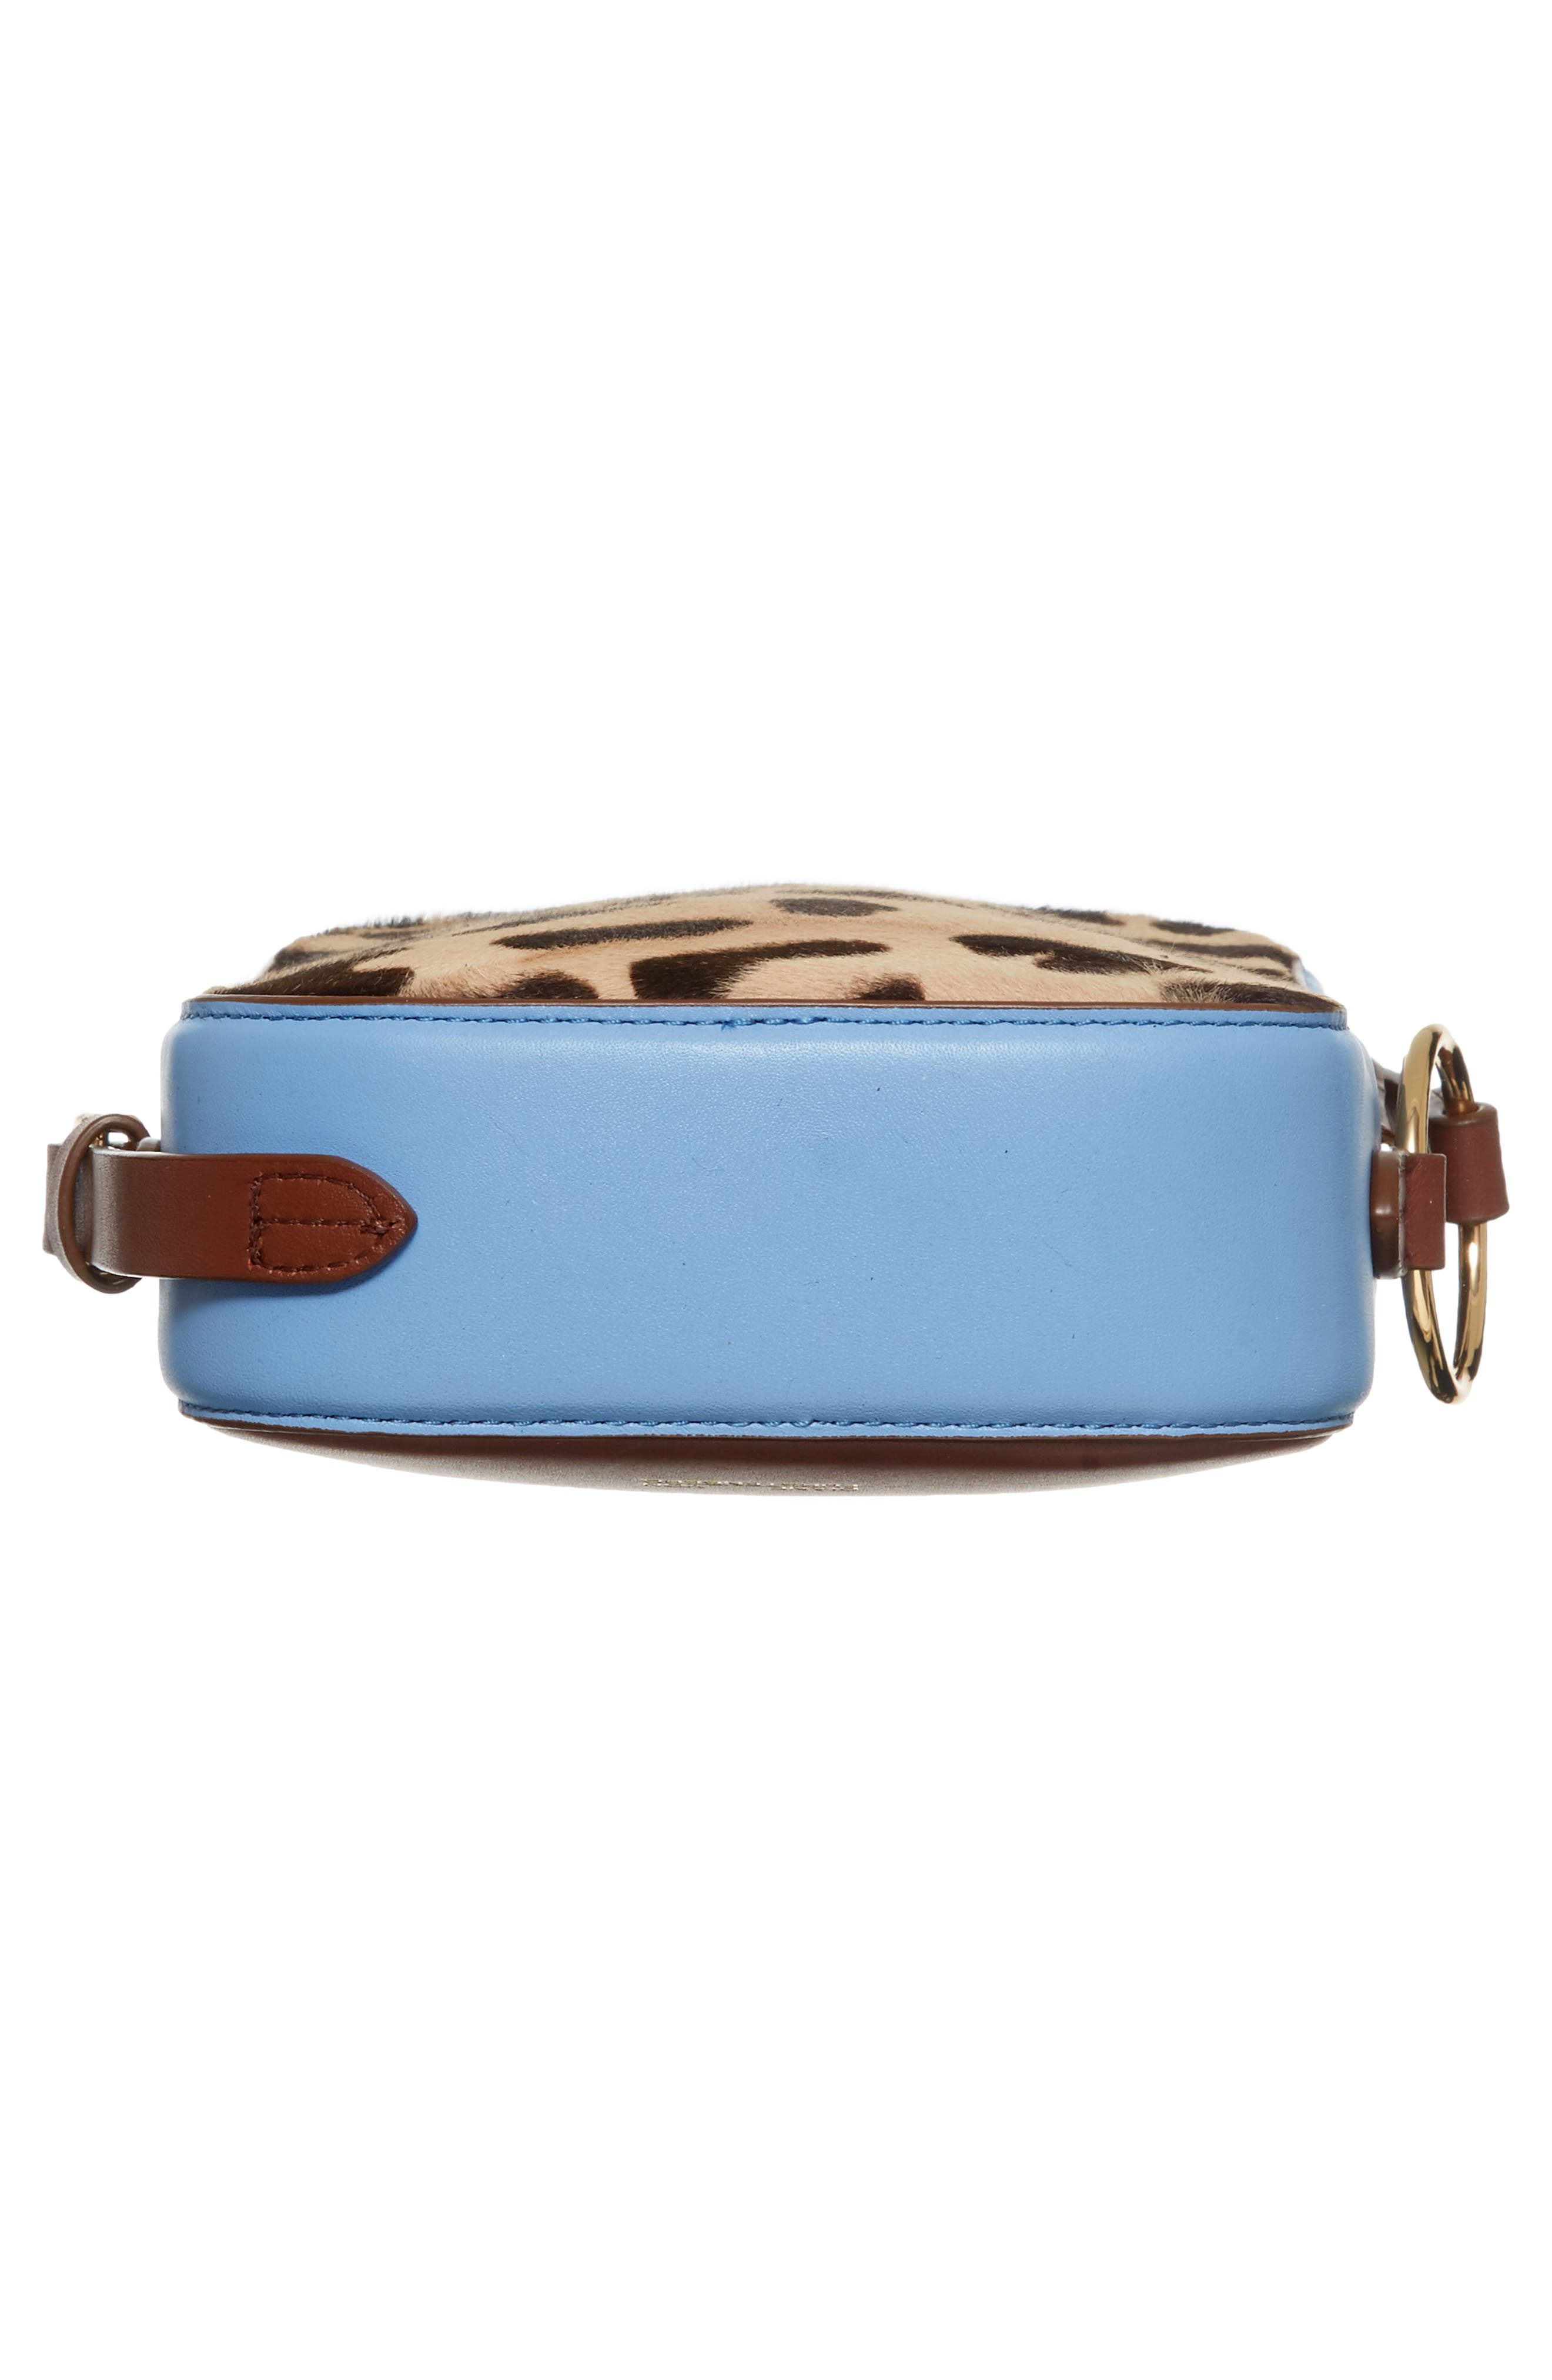 Leather & Genuine Calf Hair Camera Bag,                             Alternate thumbnail 6, color,                             Leopard/ Powder Blue